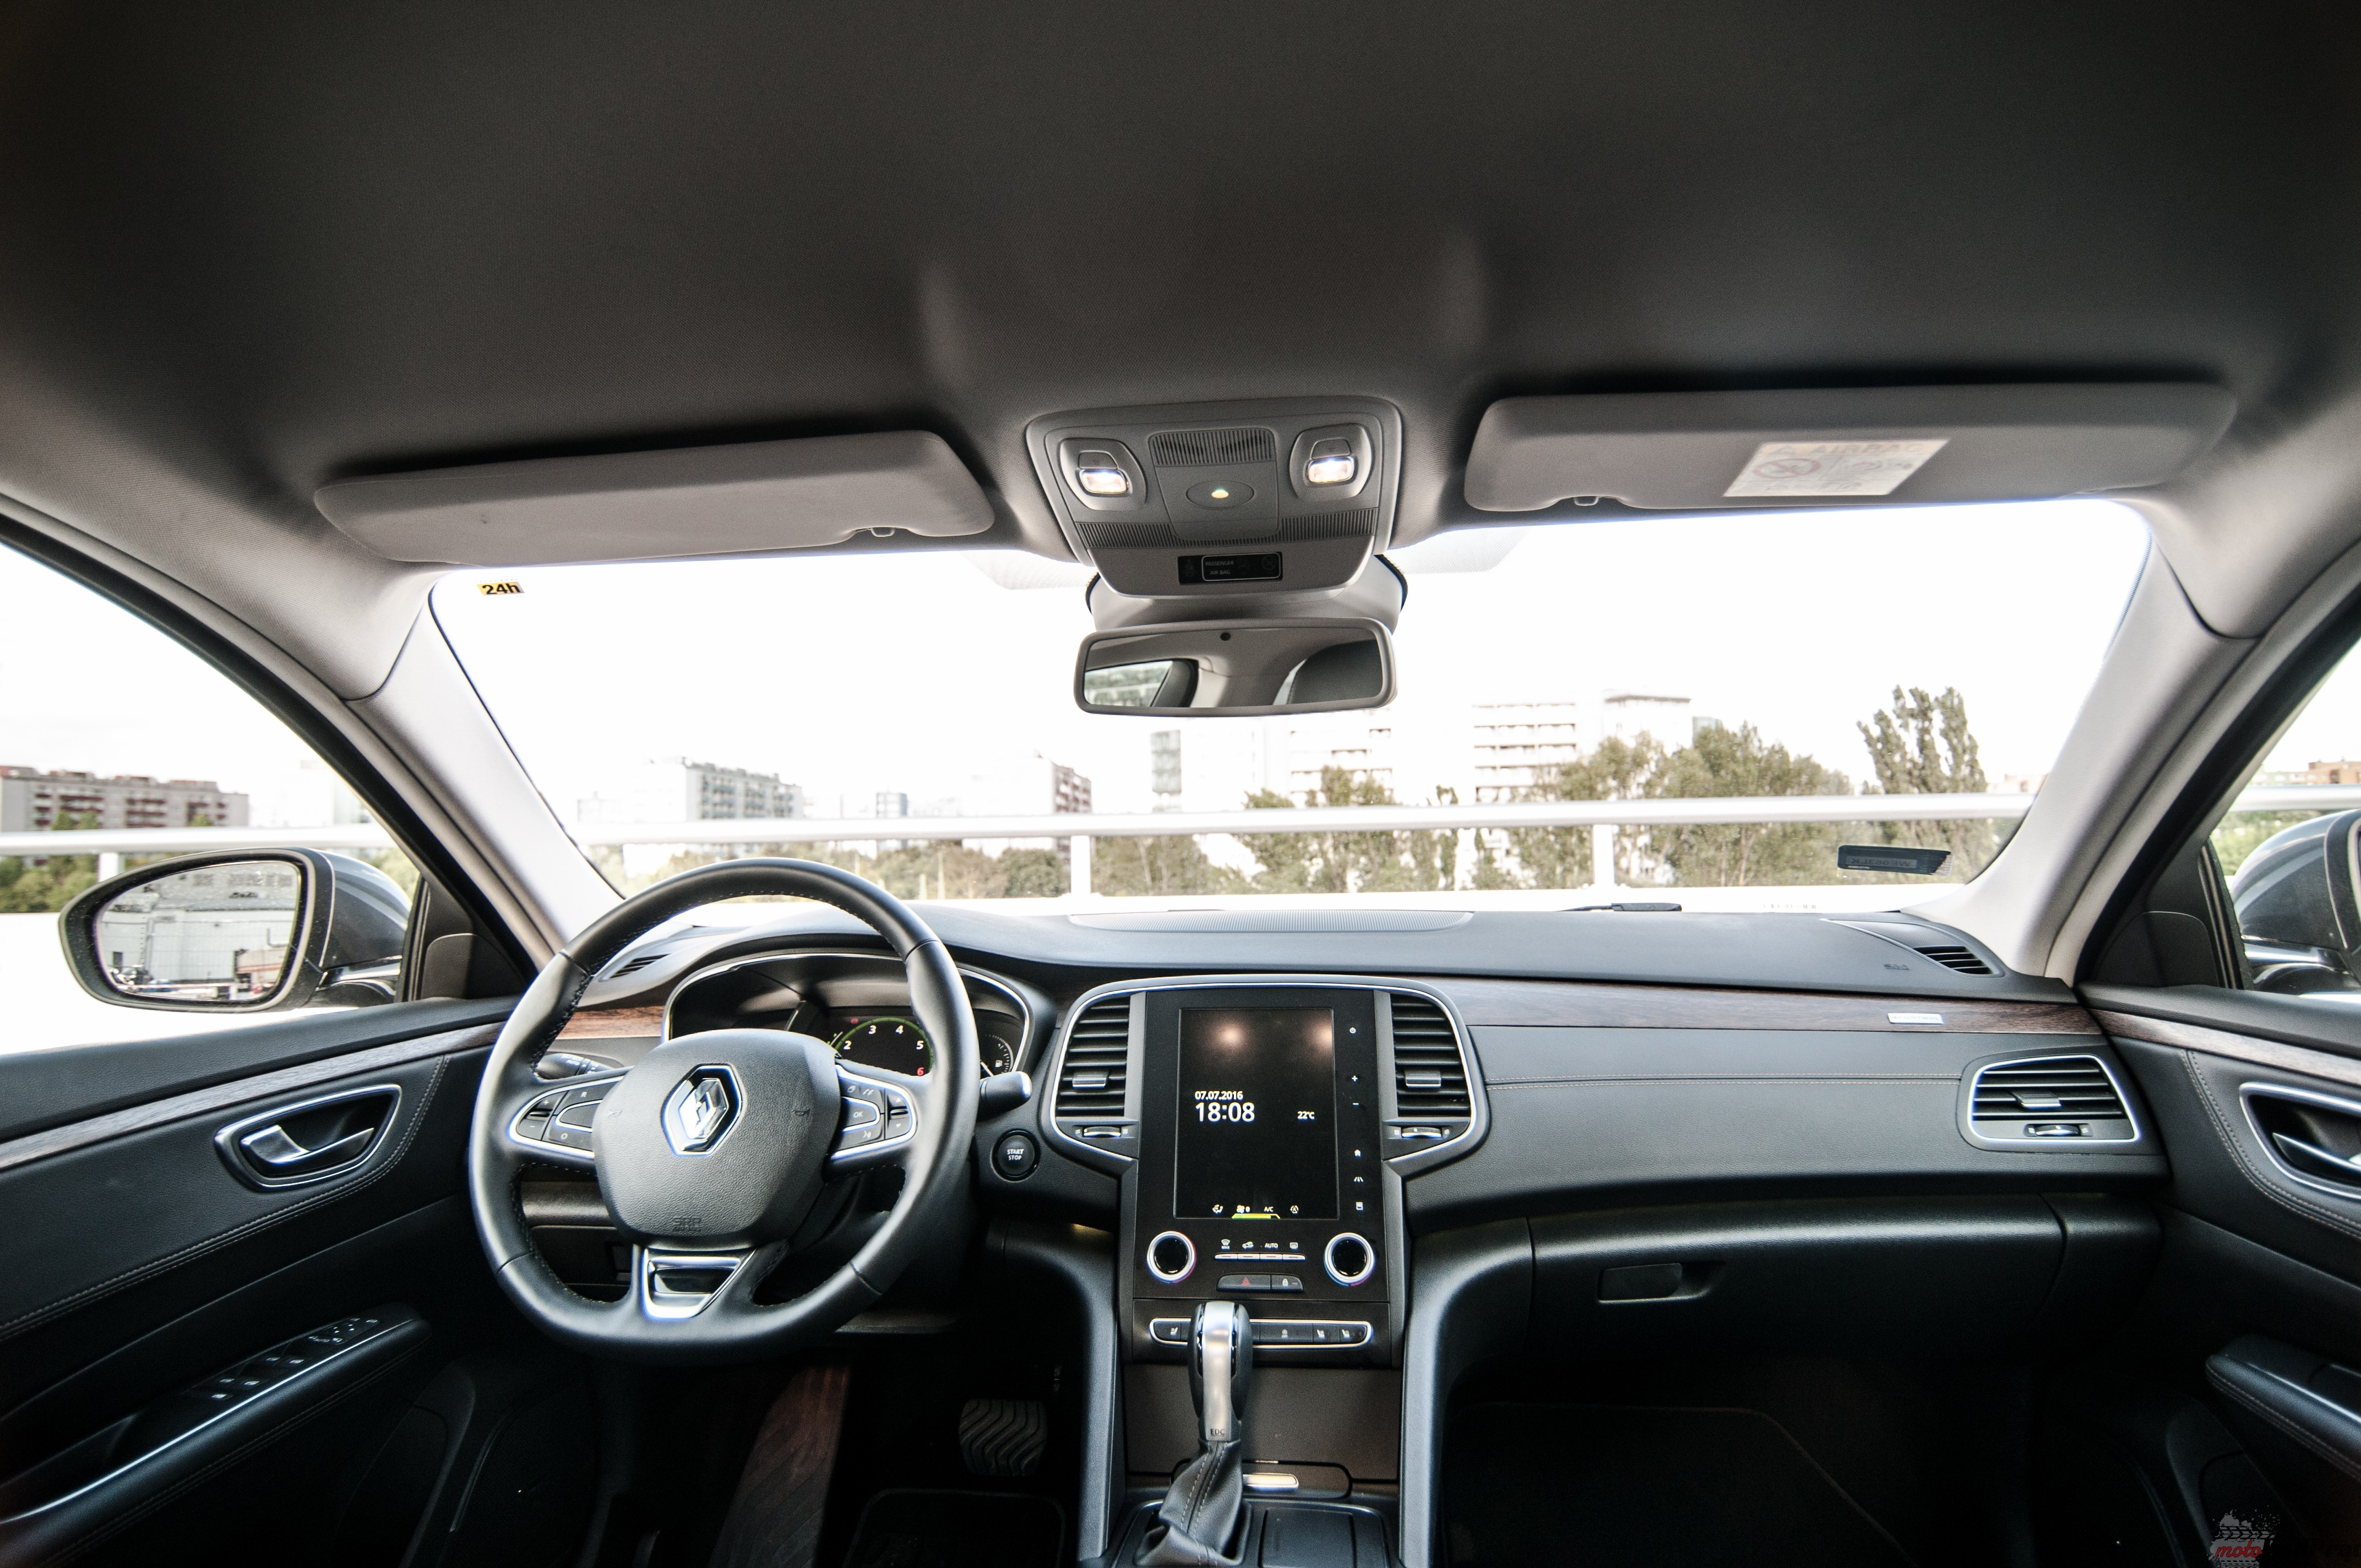 Renault Talisman 2 TEST: Renault Talisman 1.6 TCe INTENSE – firmowy reprezentant